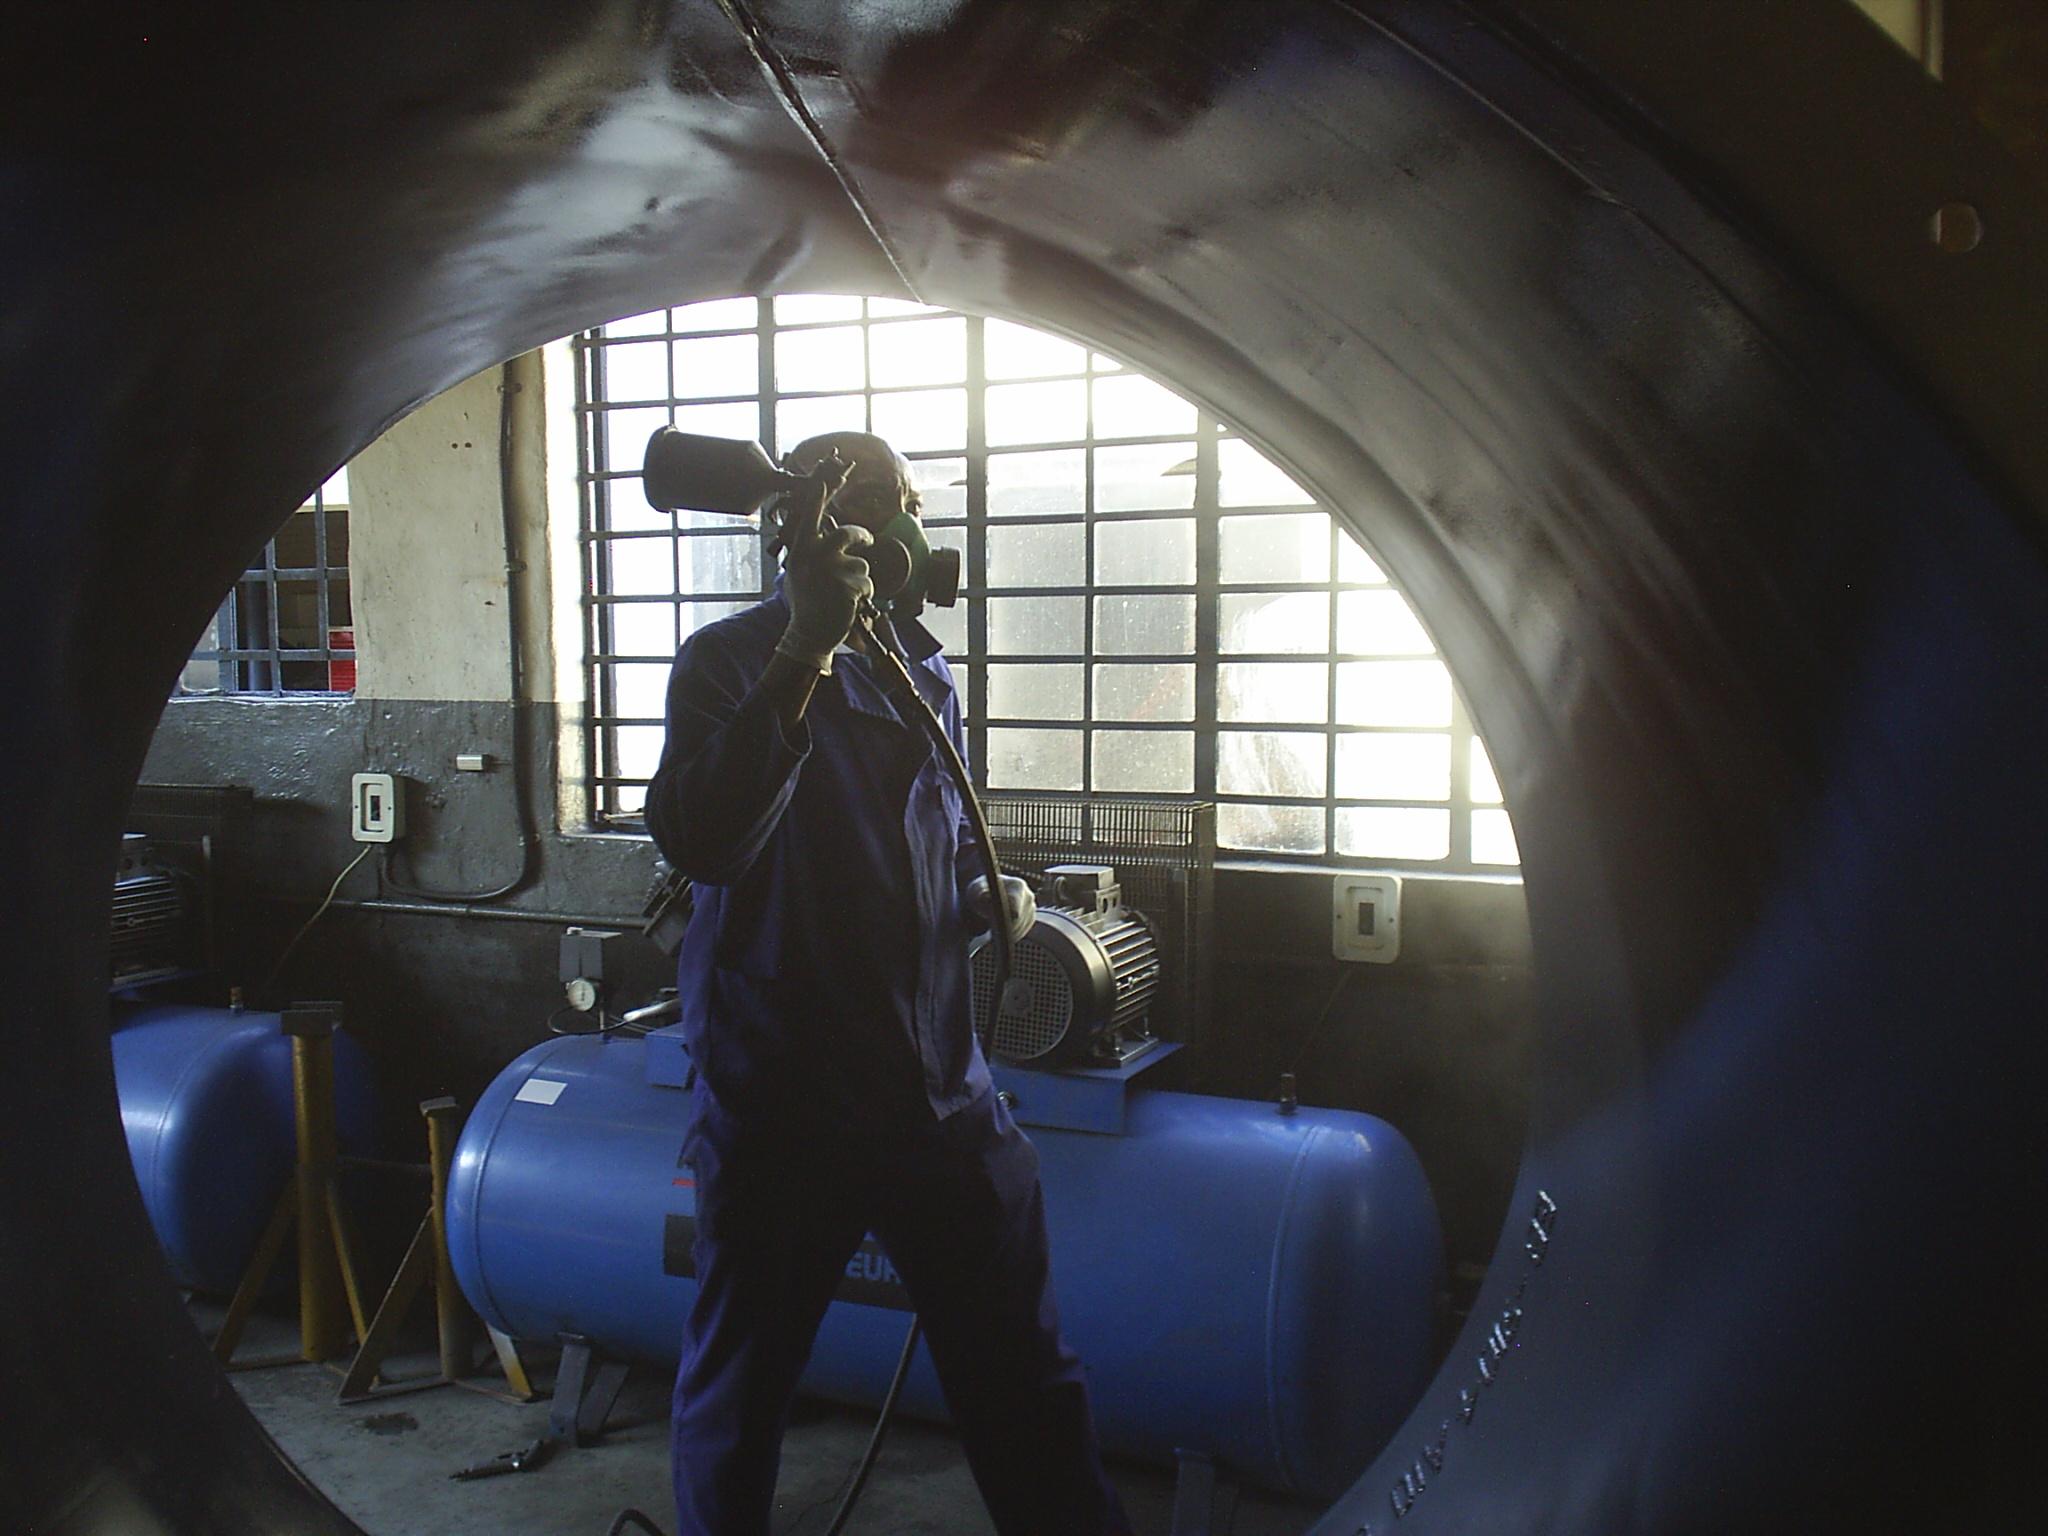 v large pipe 9